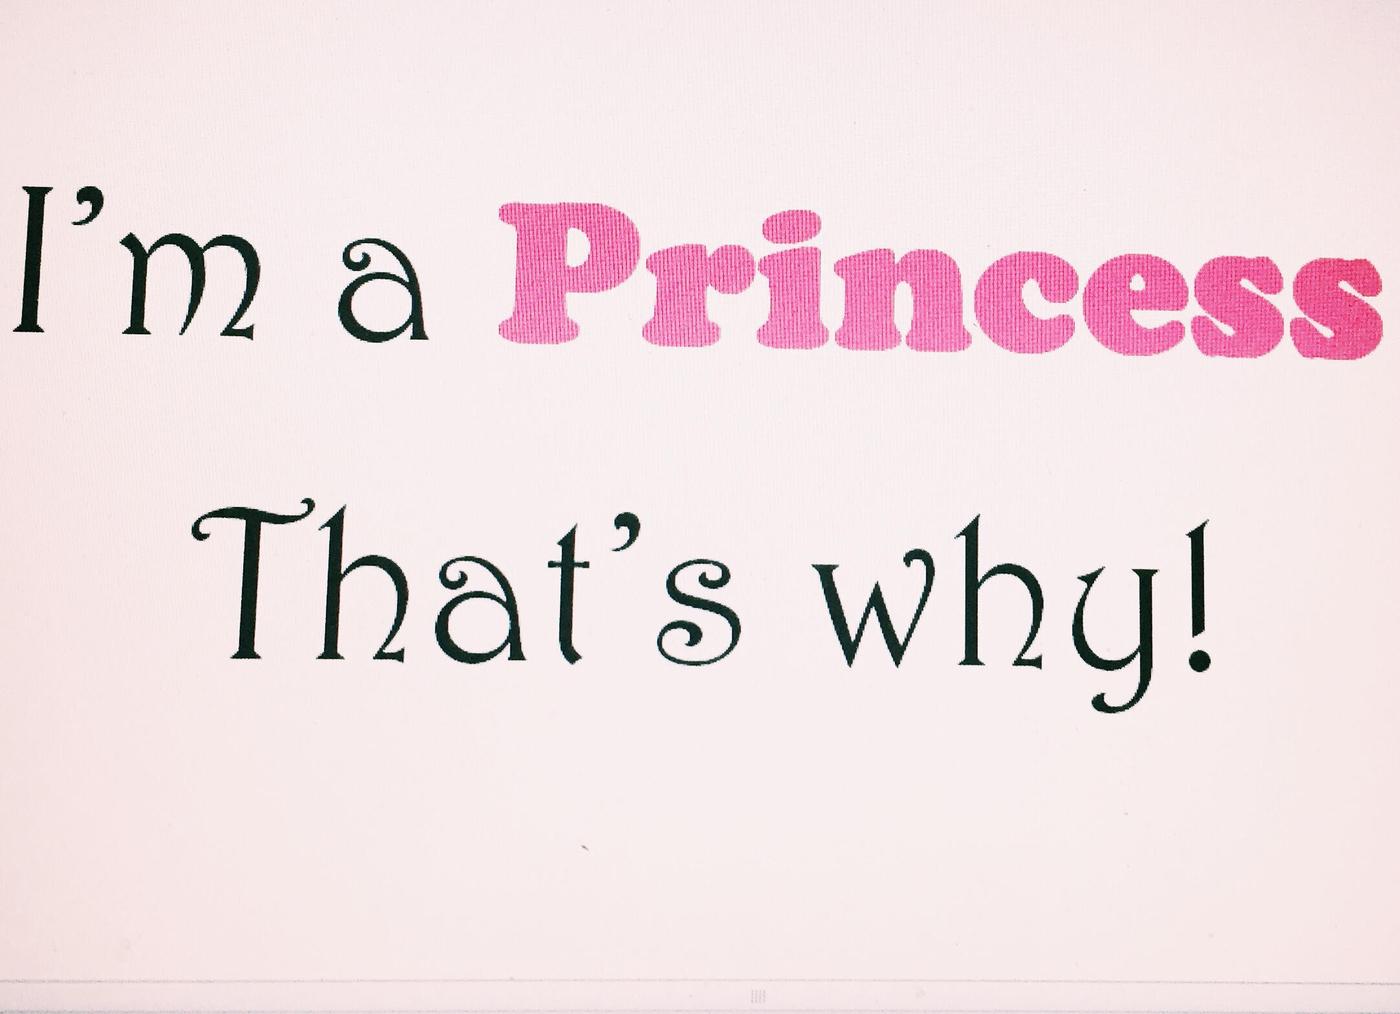 prinsessa.jpg